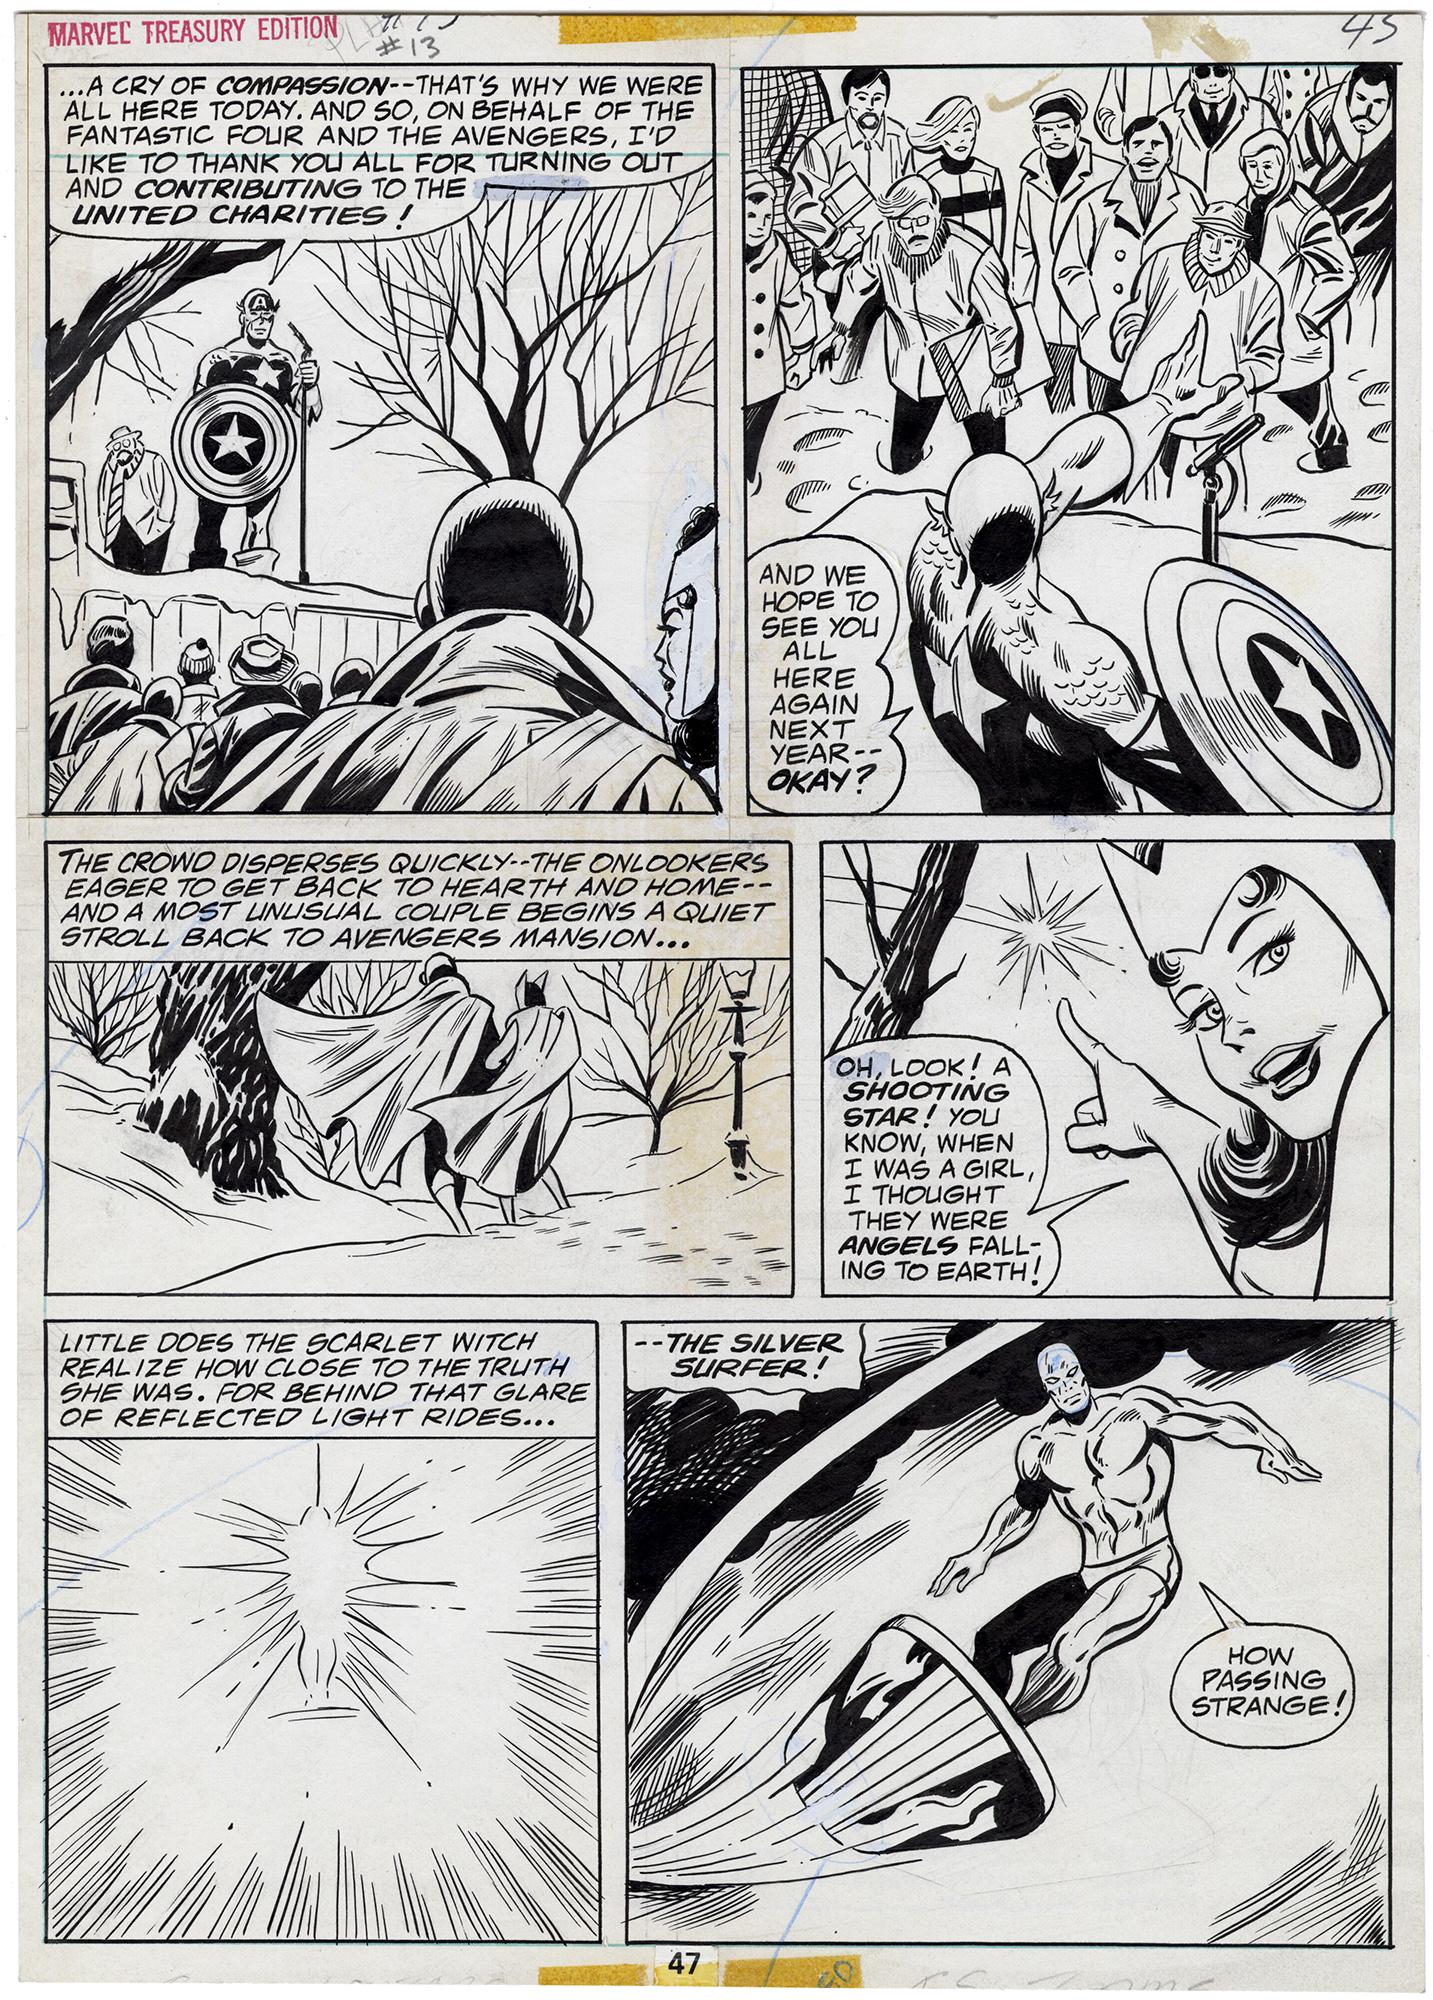 Marvel Treasury Edition #13 p47